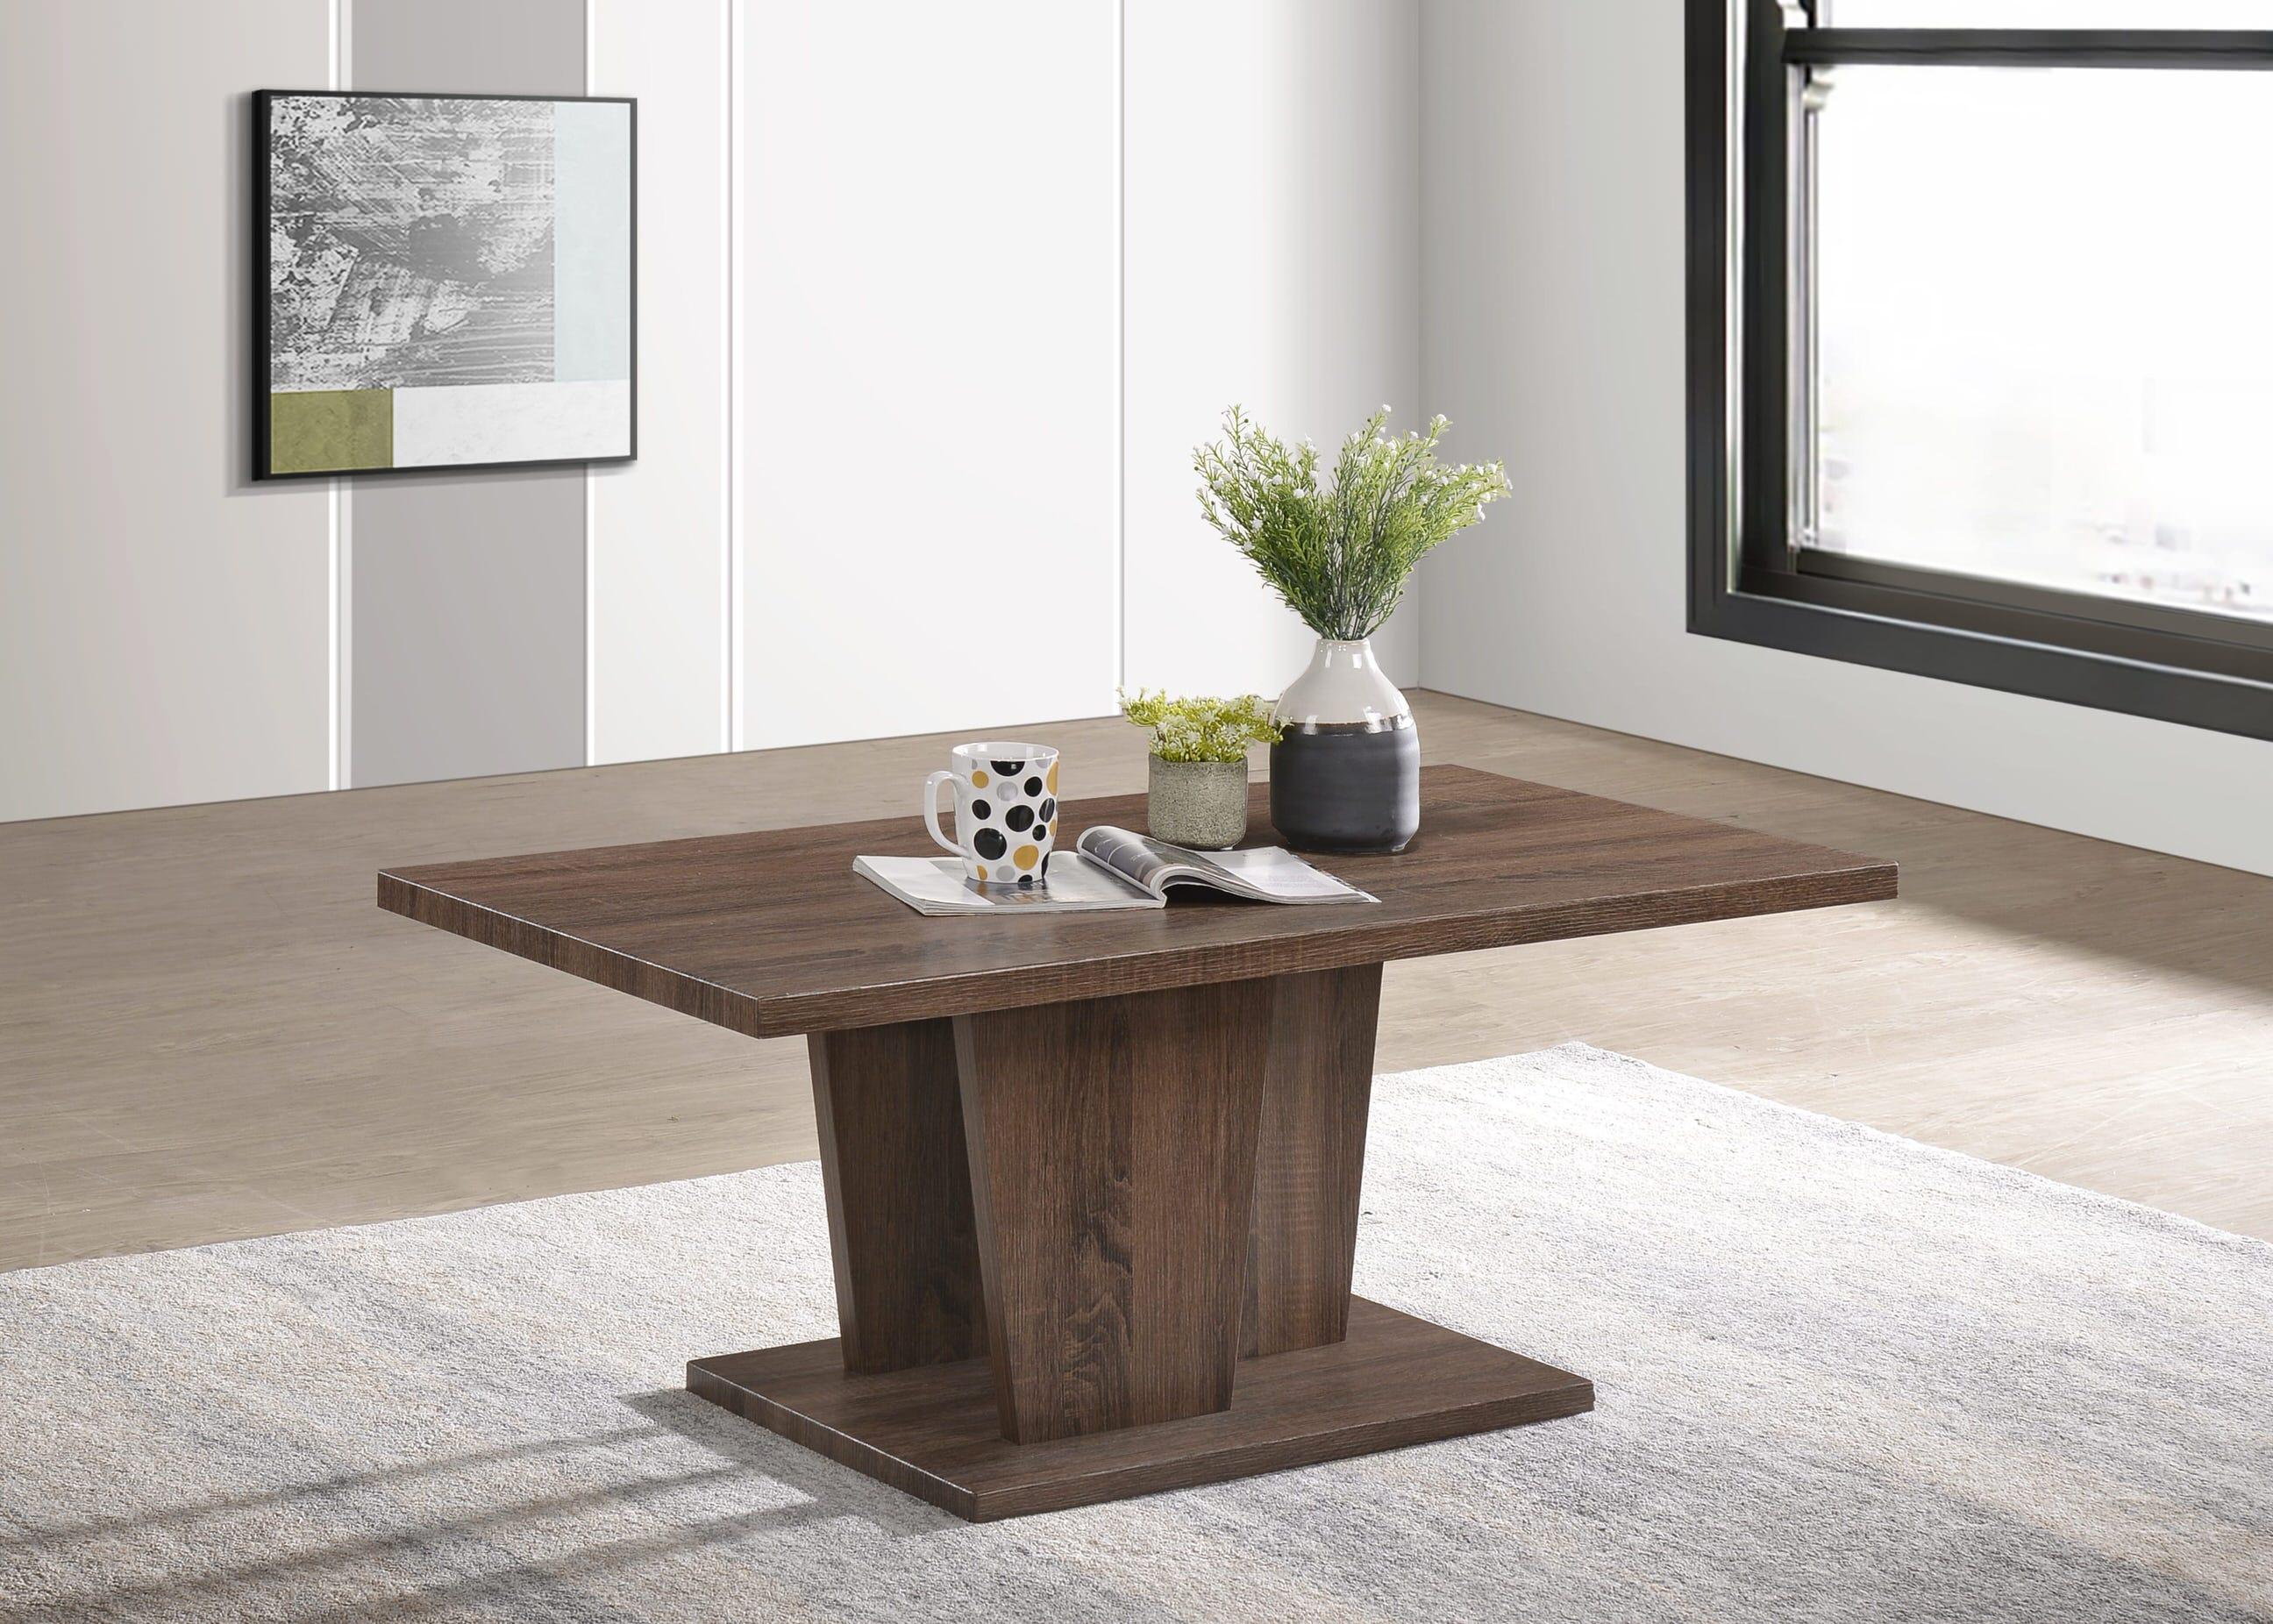 Maya Coffee Table.Maya Dark Brown Wood Coffee Table By Casamode Functional Furniture